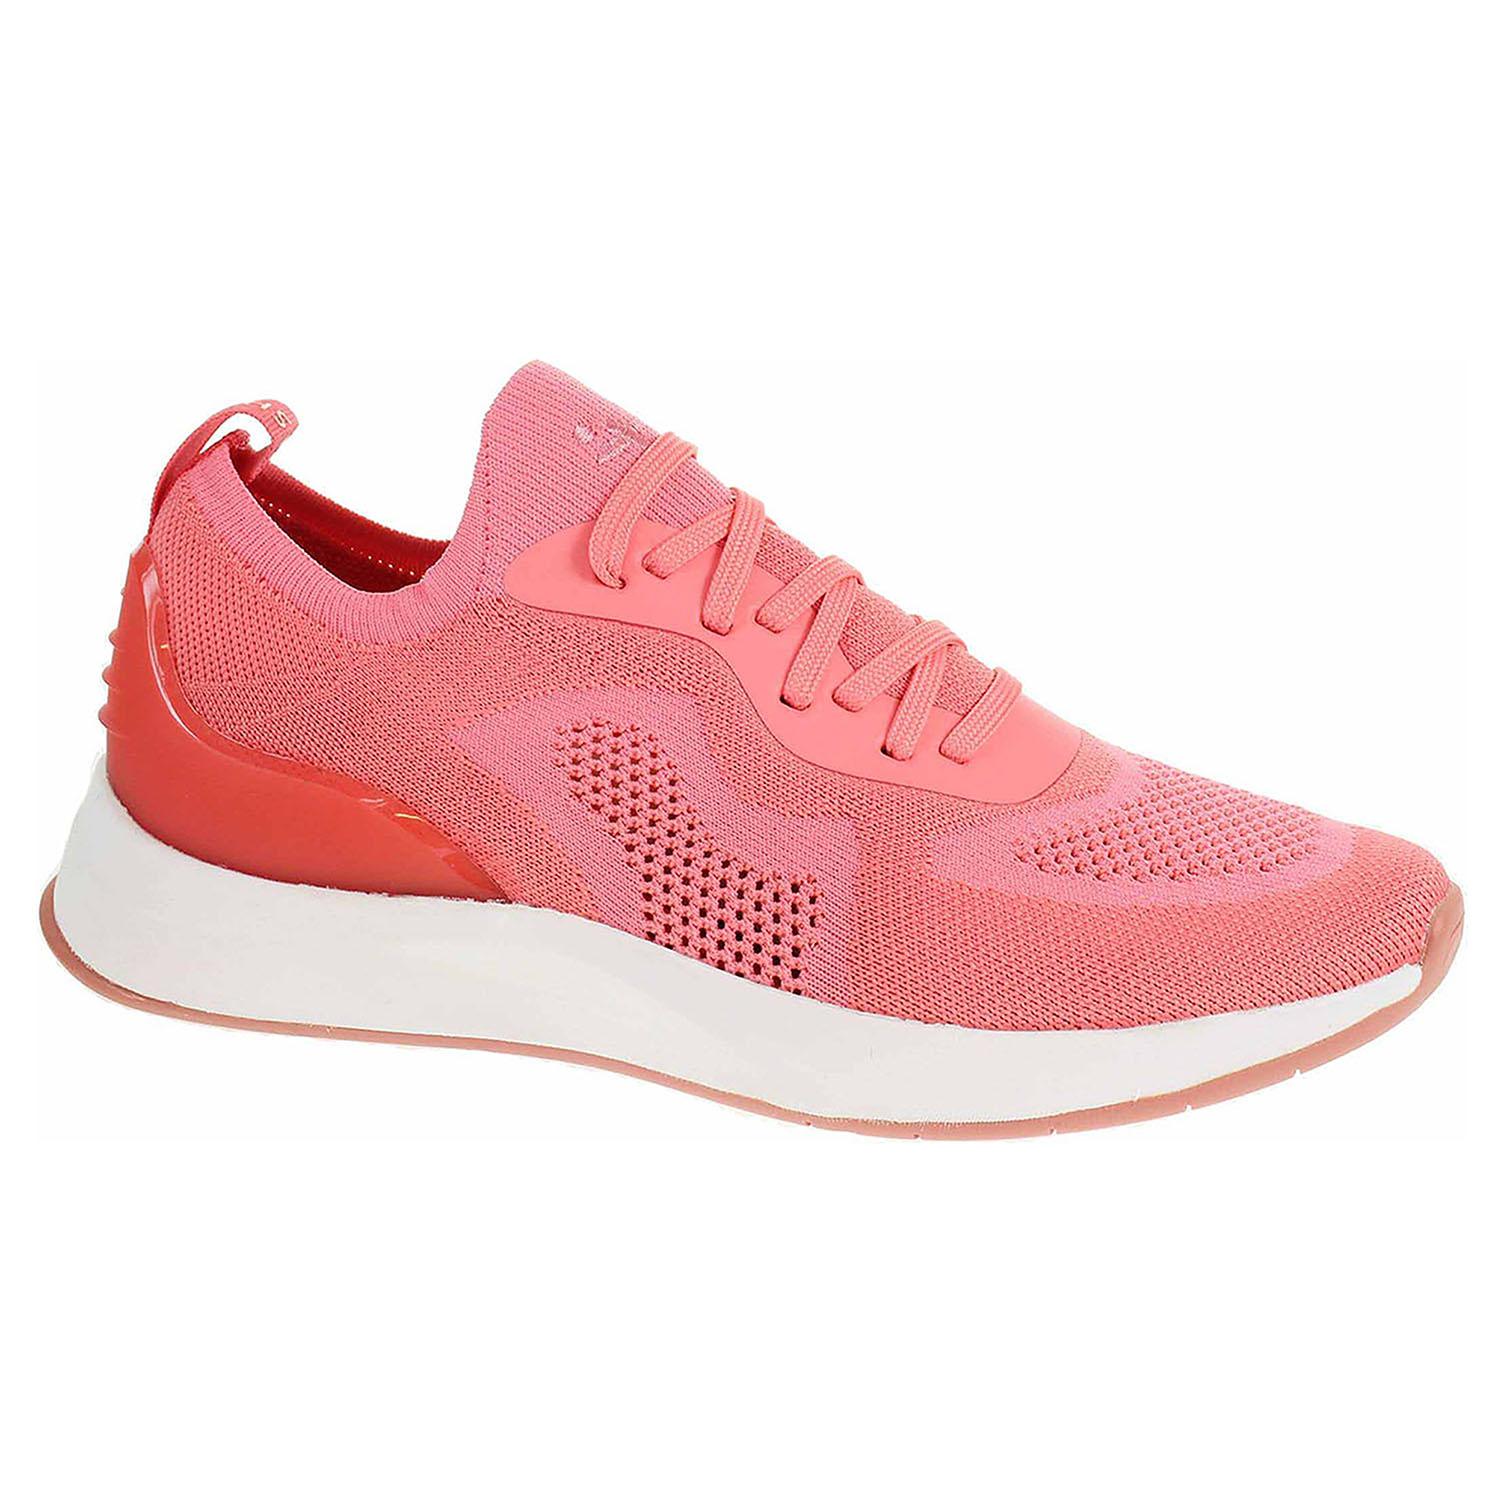 Dámská obuv Tamaris 1-23705-22 coral 1-1-23705-22 563 37